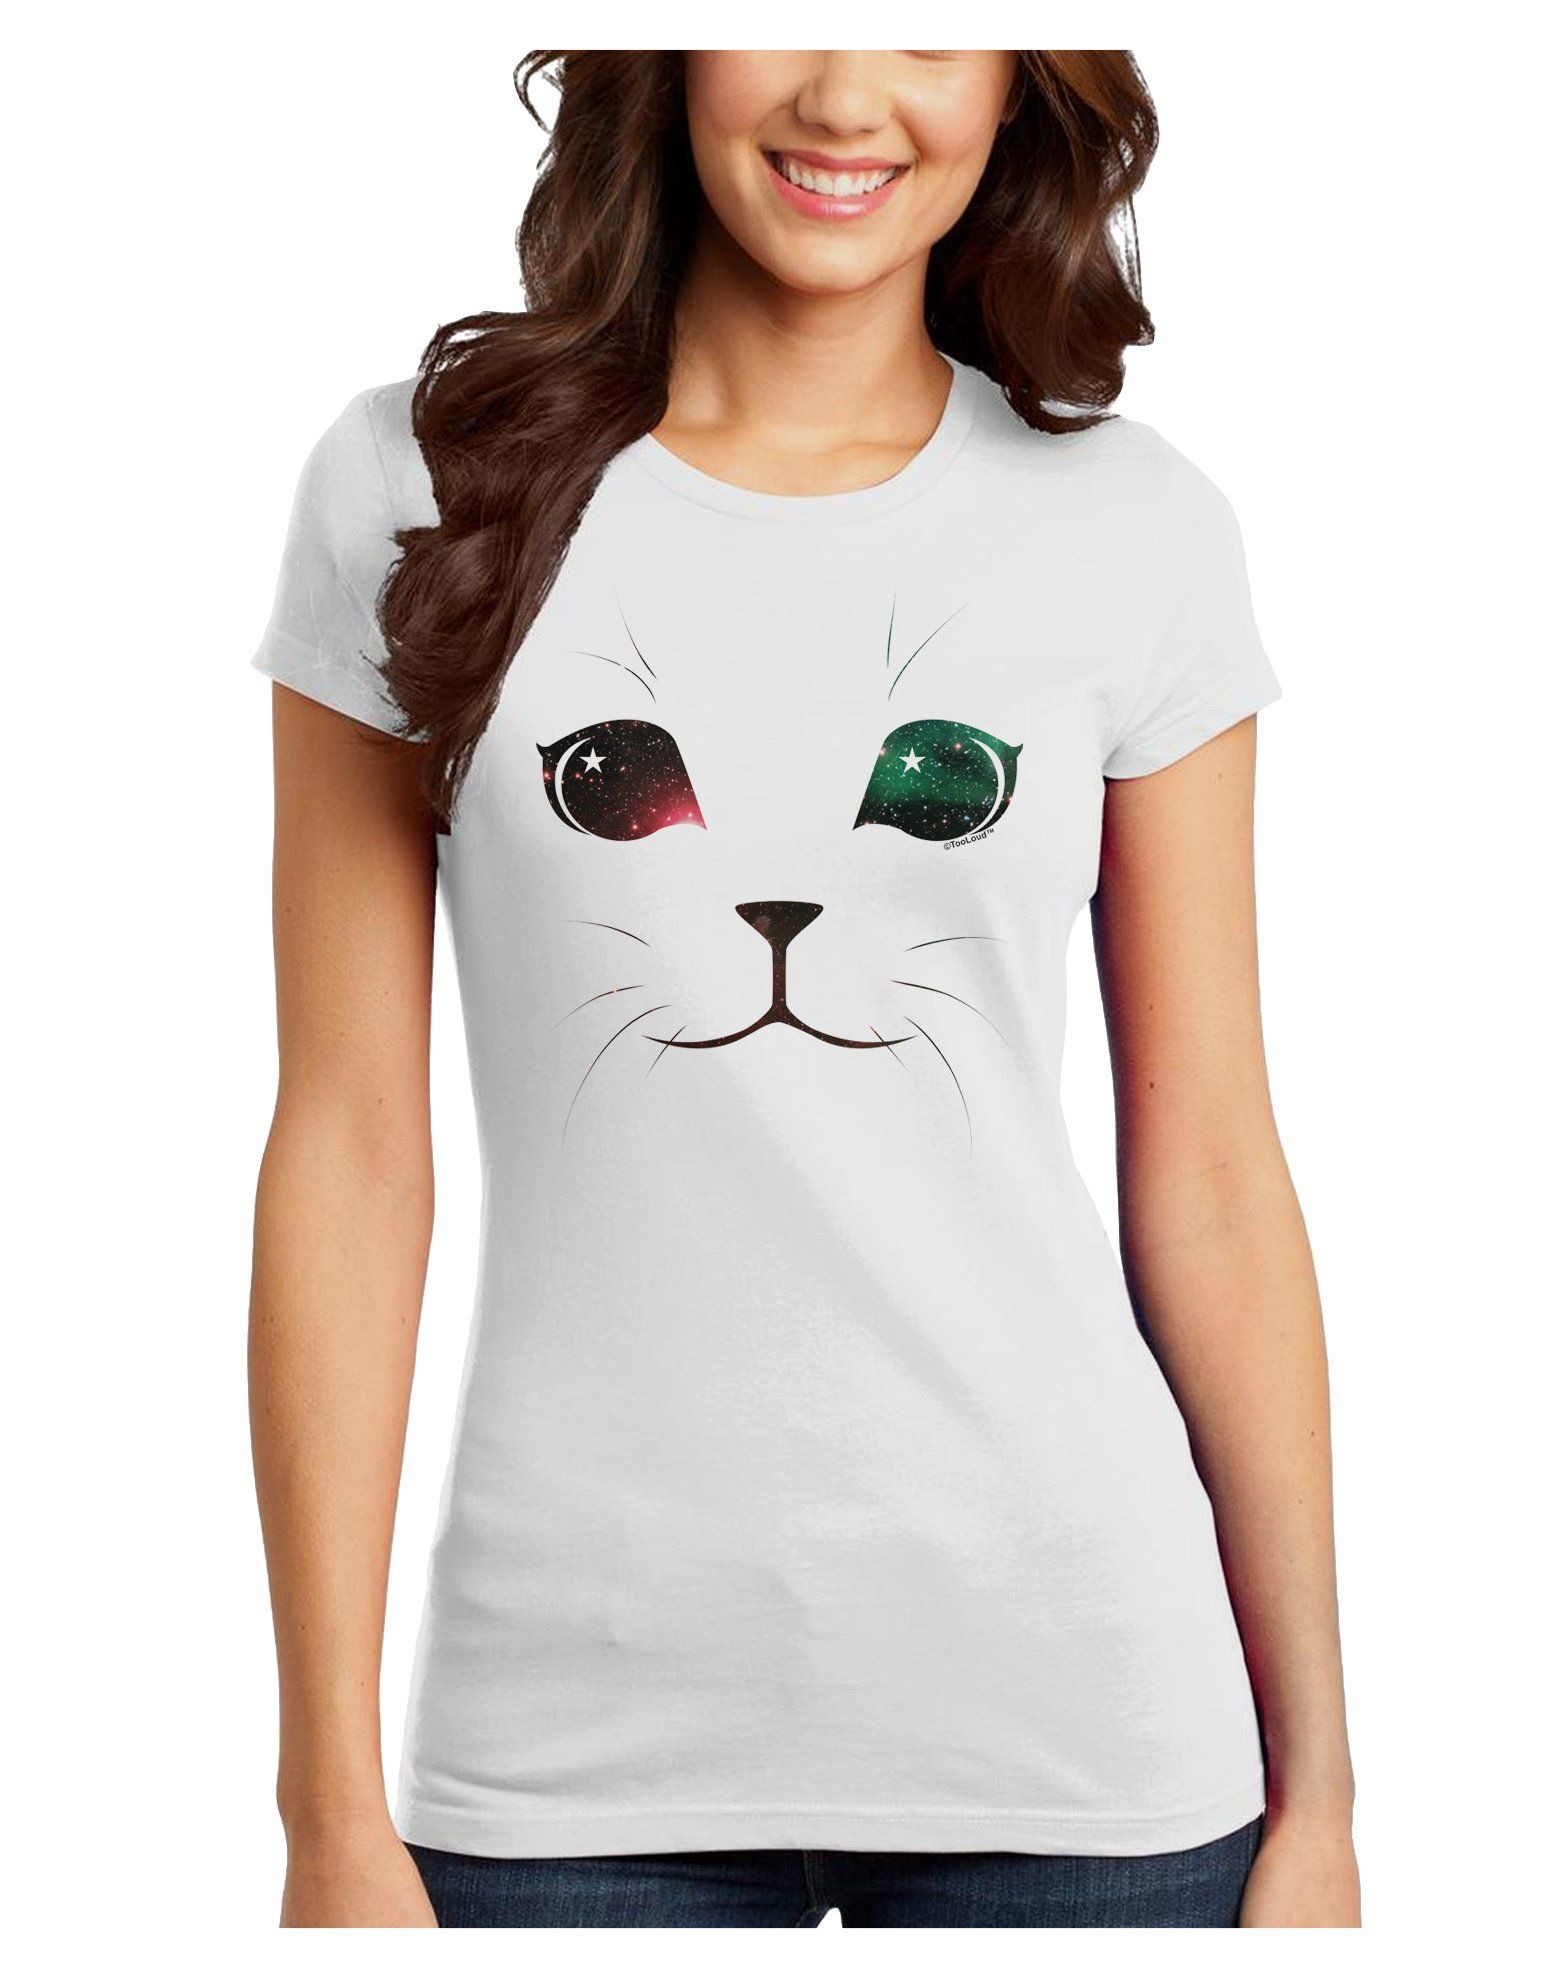 Adorable Space Cat Juniors Petite T-Shirt